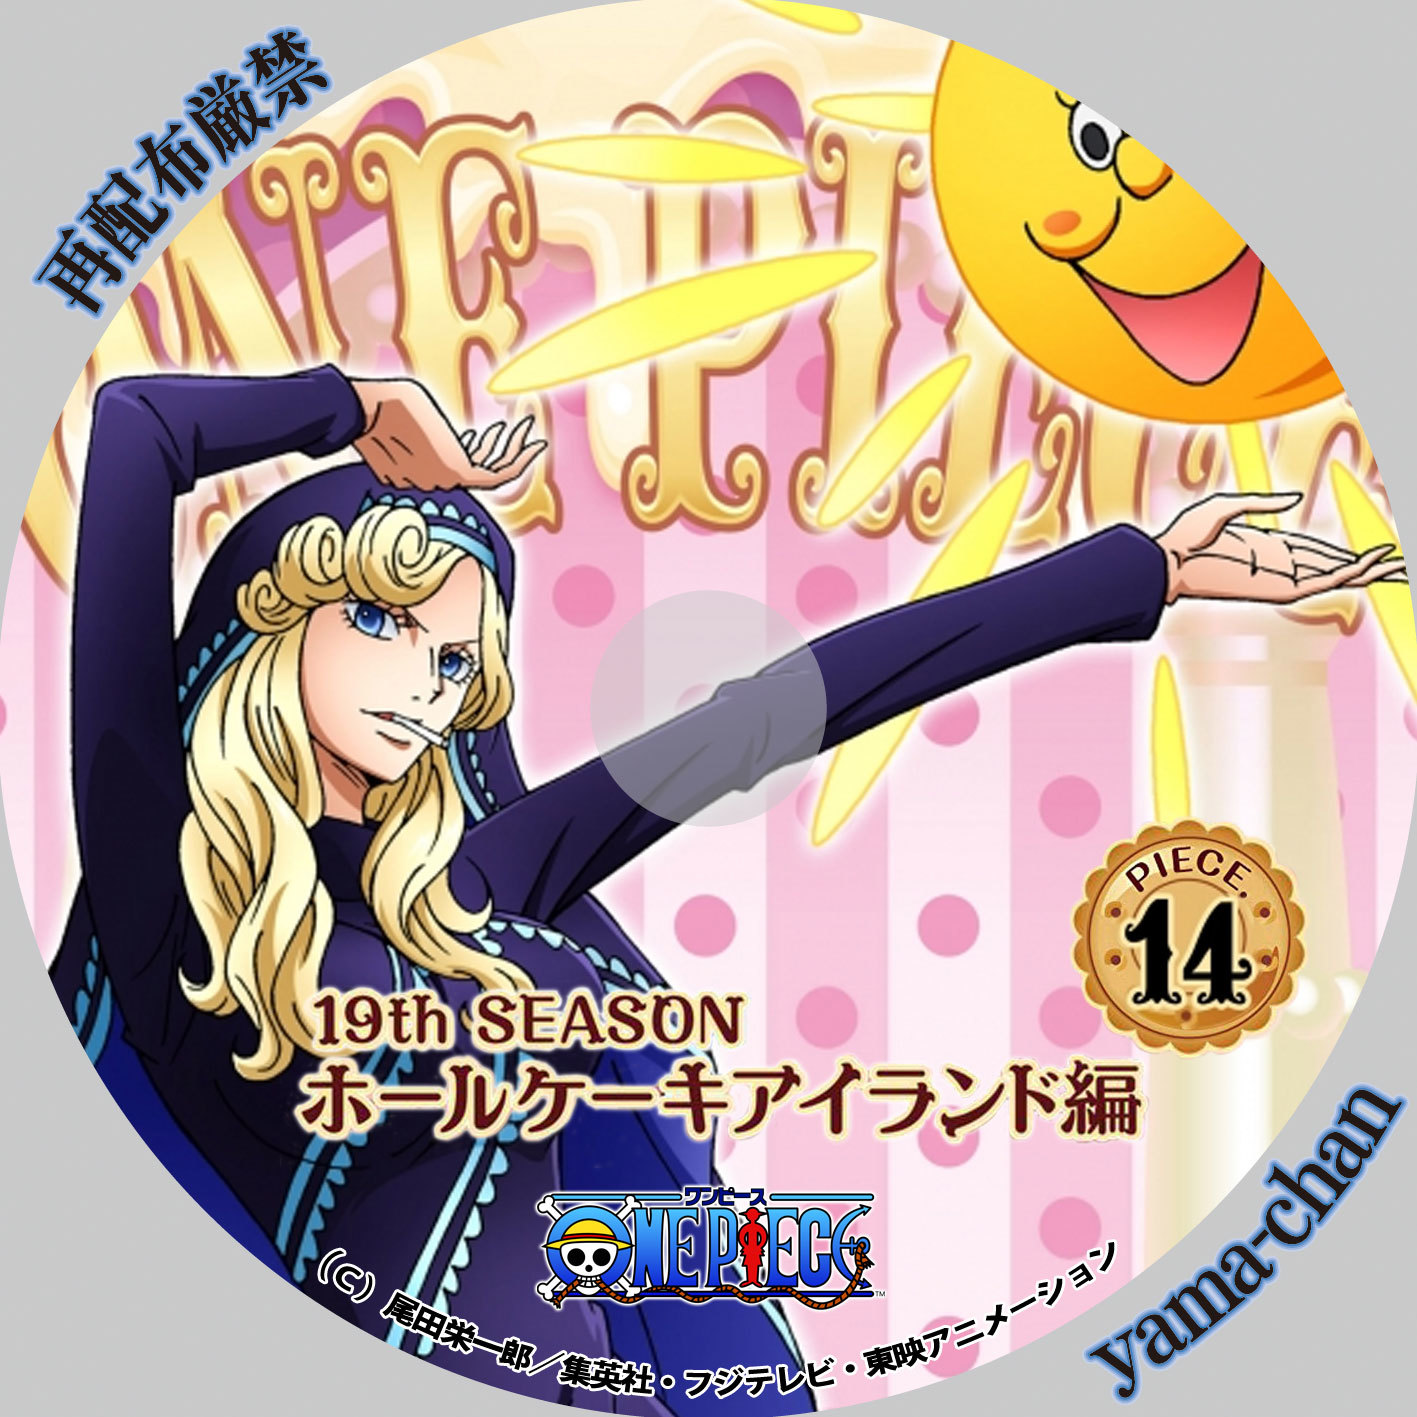 Yama-chanのラベル工房2 ワンピース19th Seasonホールケーキ